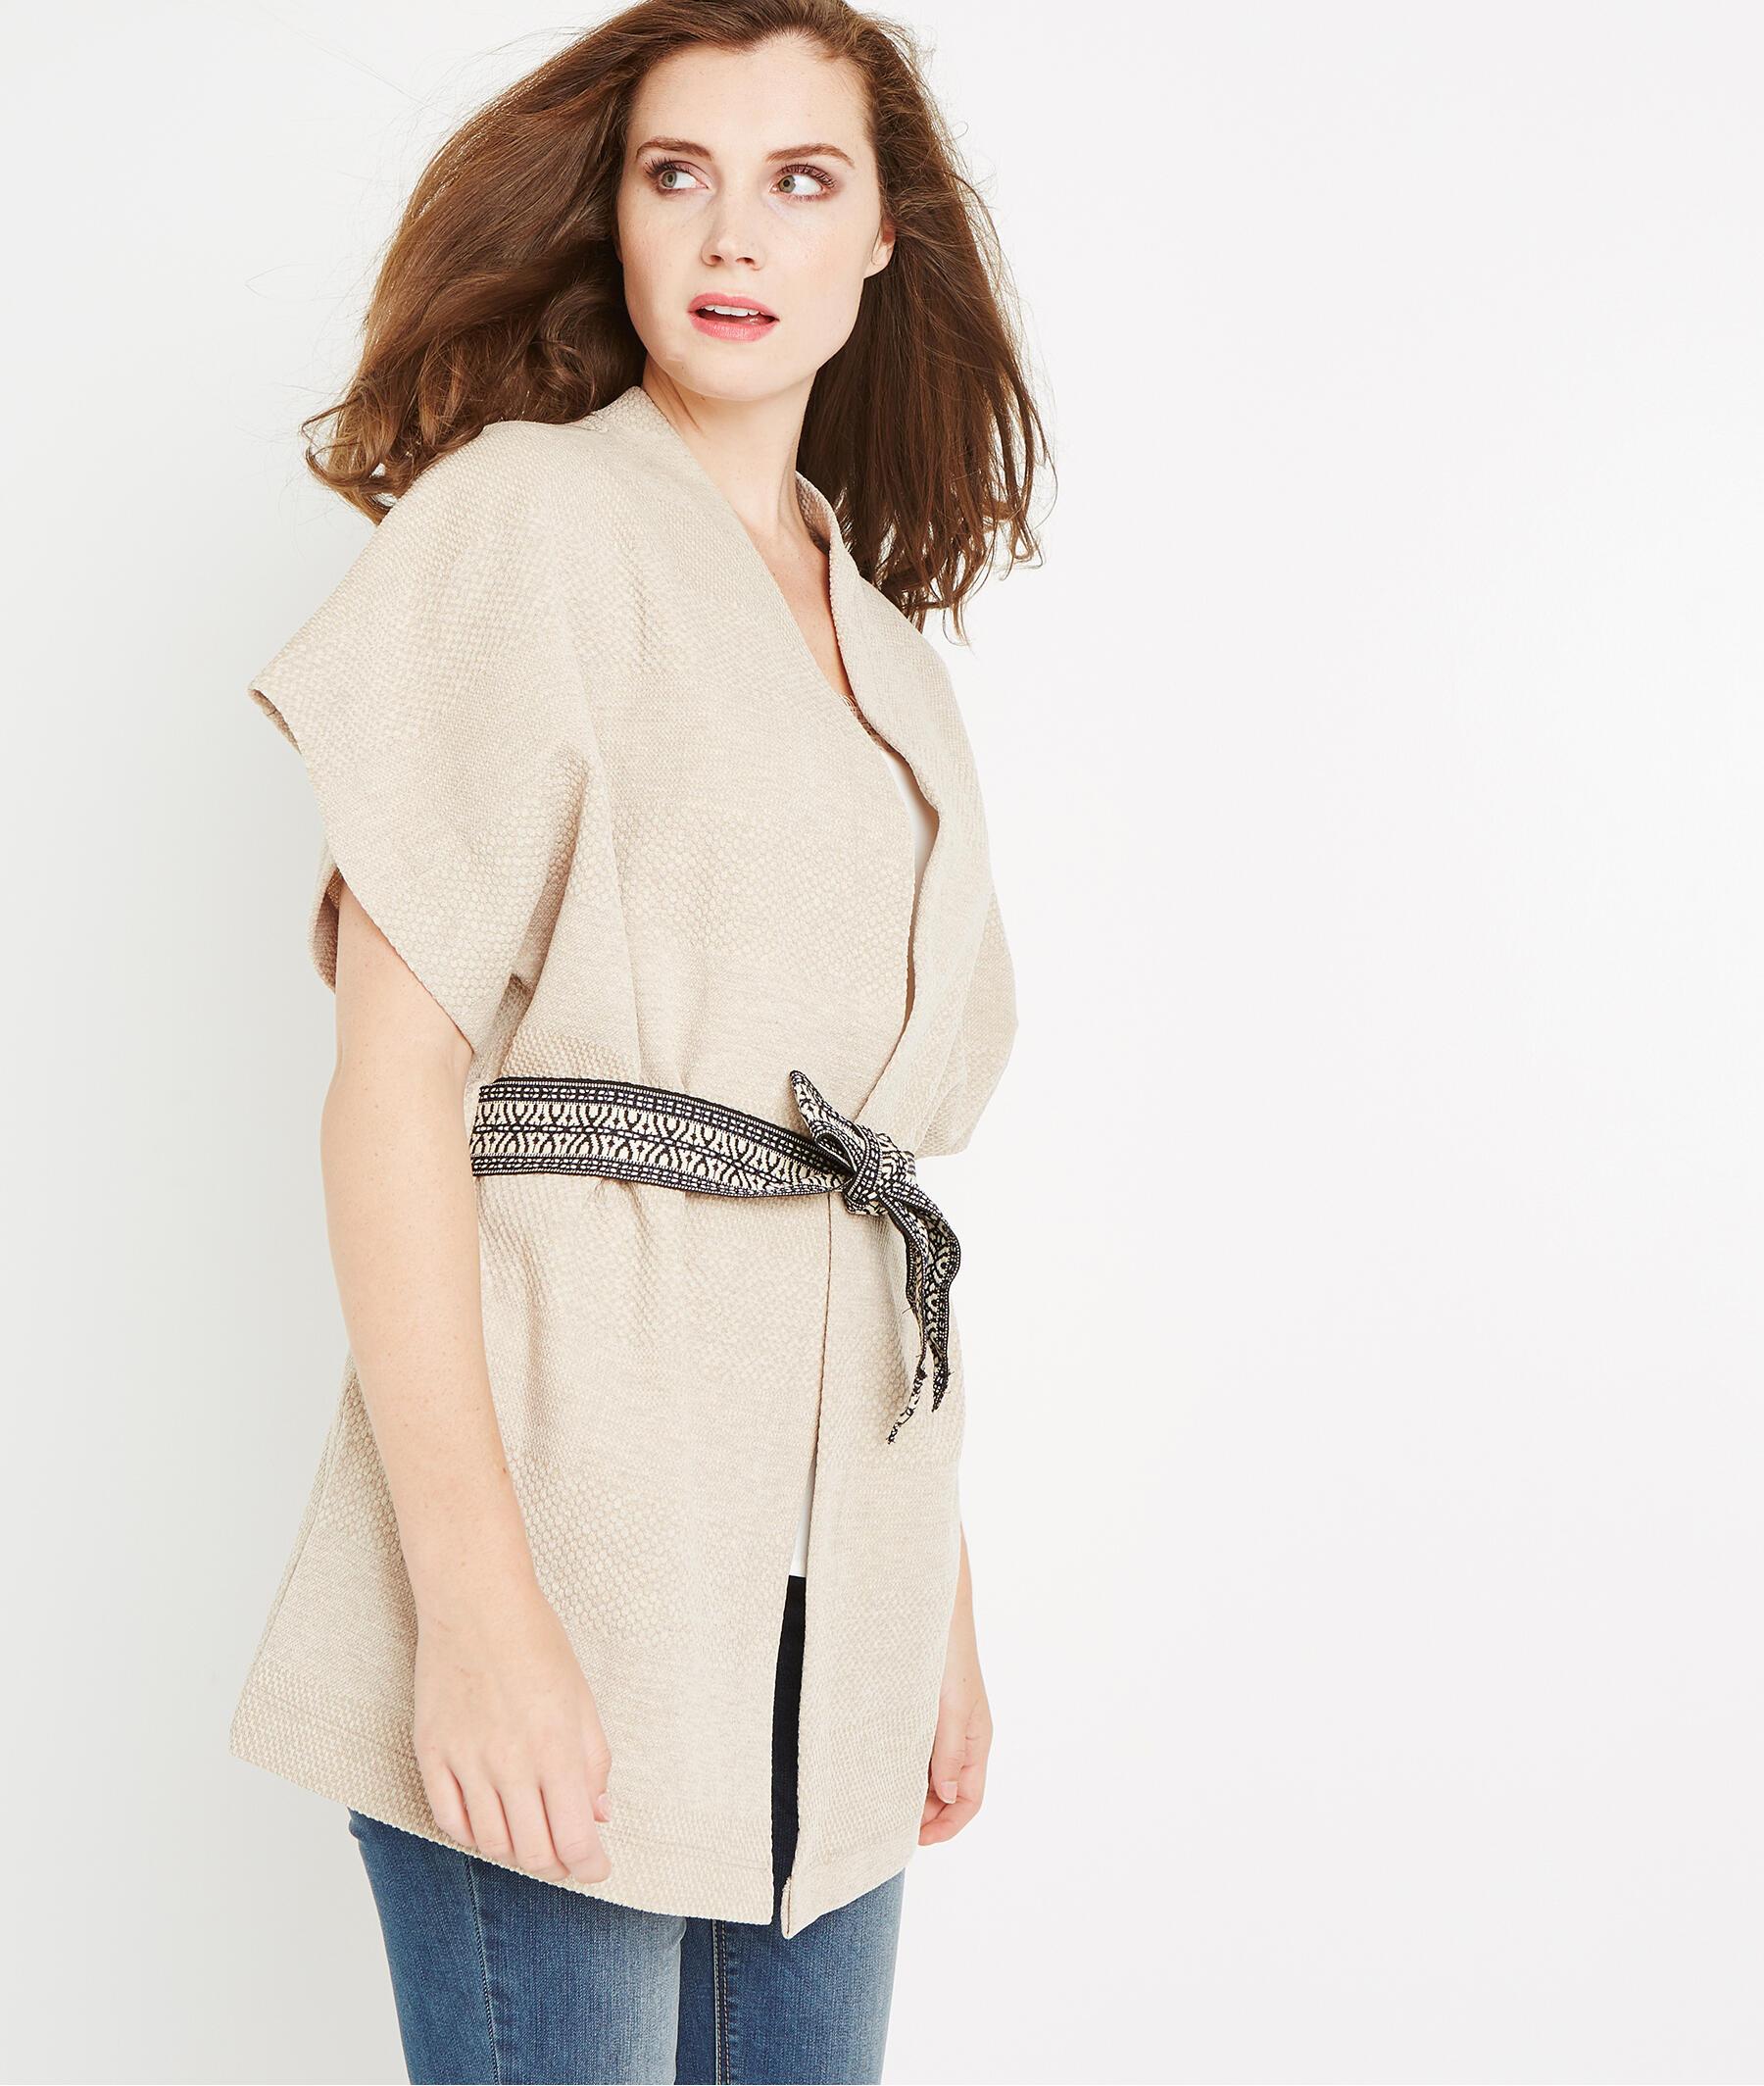 Veste kimono en maille avec ceinture BEIGE